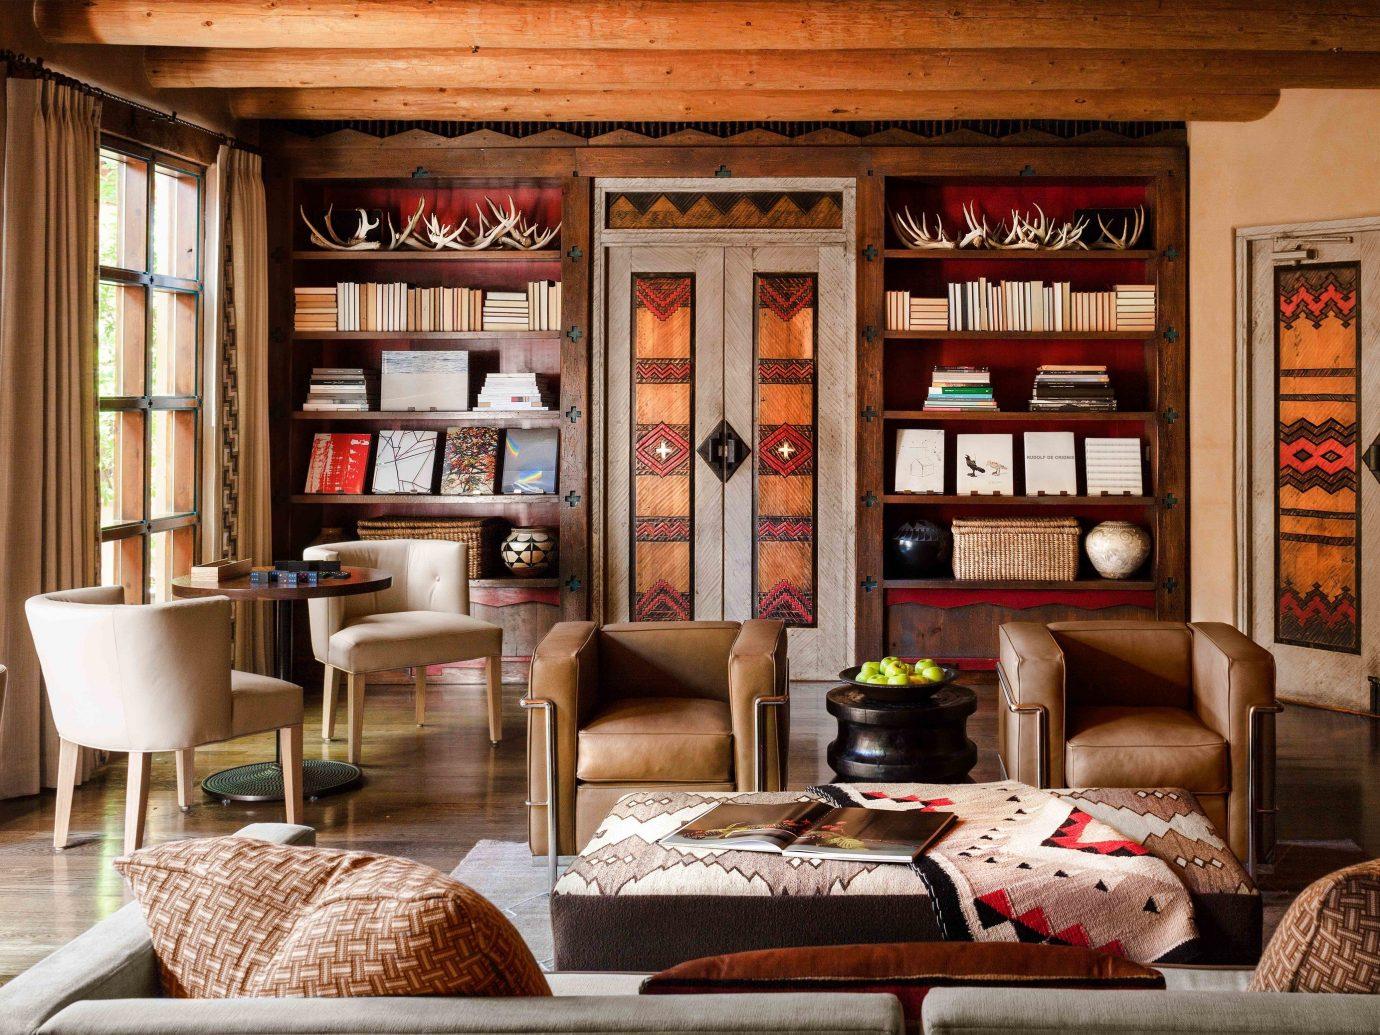 indoor Living shelving chair room bookcase furniture living room interior design shelf table window